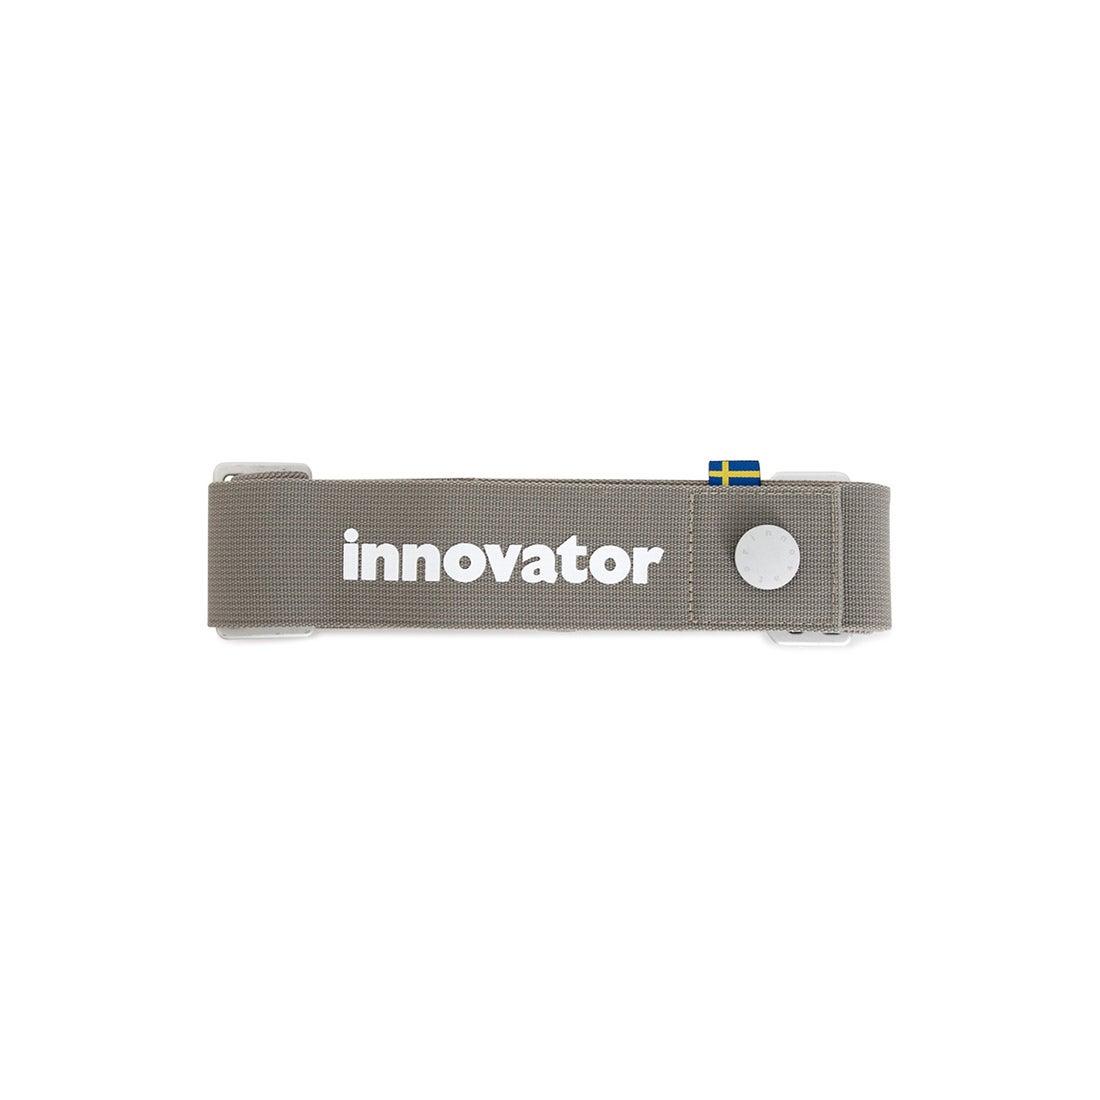 【SAC'S BAR】イノベーター innovator スーツケースベルト INT11B GRAY メンズ